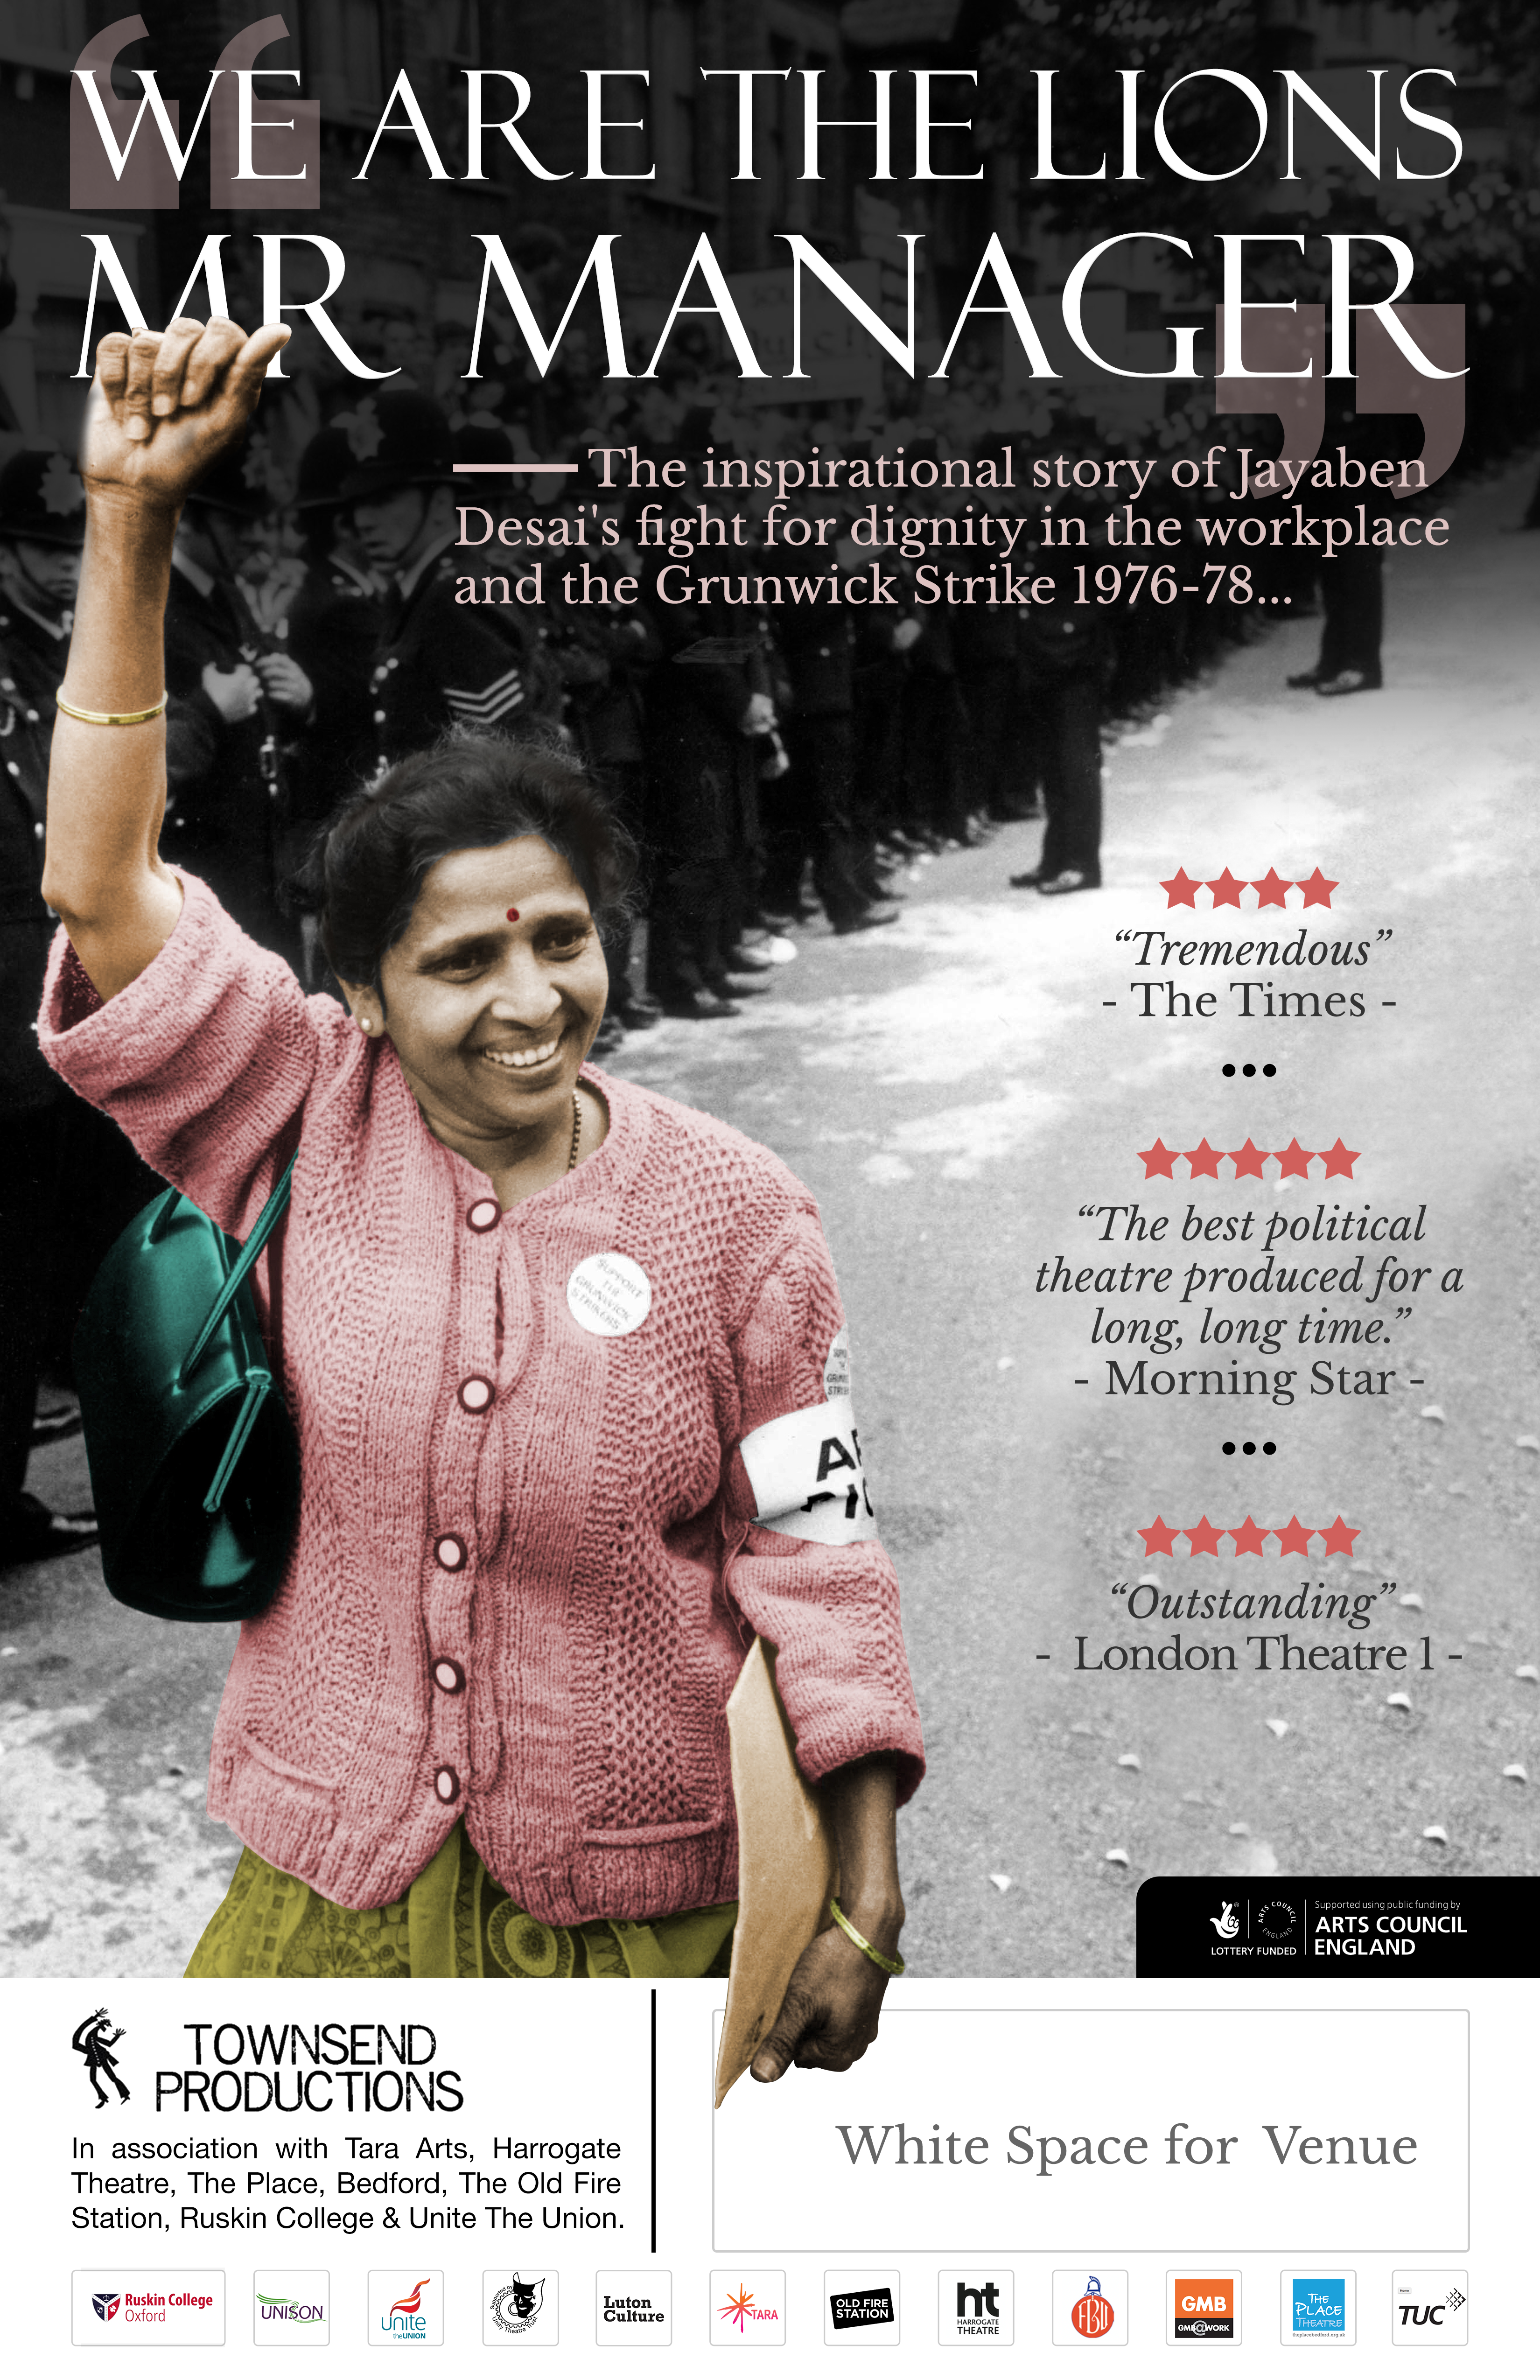 Poster Design -national touring theatre -inspirational leader Jayaben Desai and The Grunwick Strike